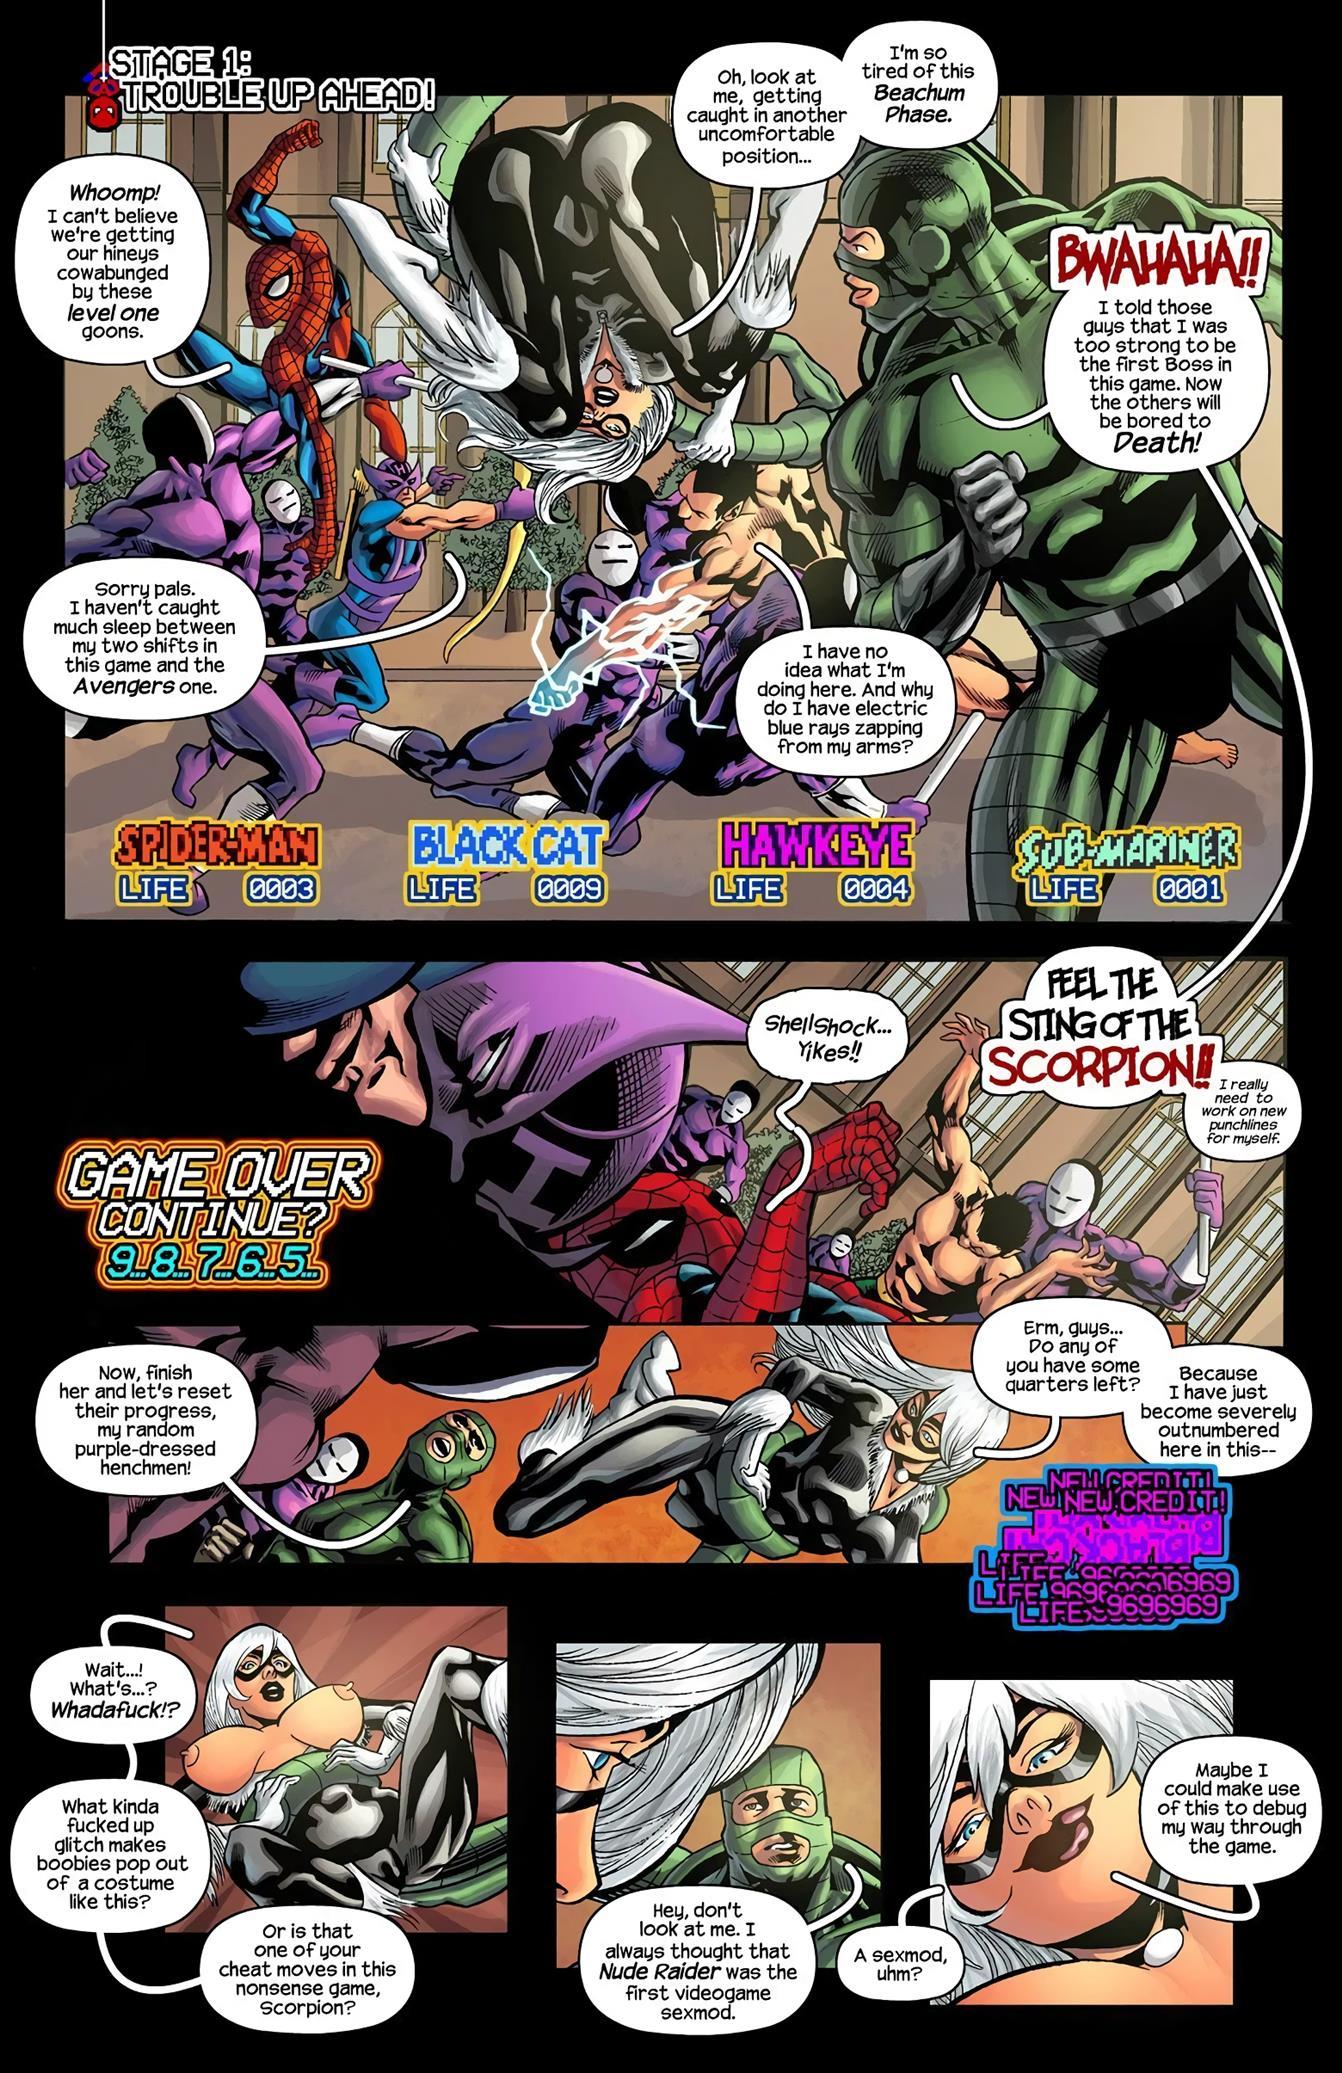 John Wolf - Spider-Man the '91 Arcade Video Game - Foto 3